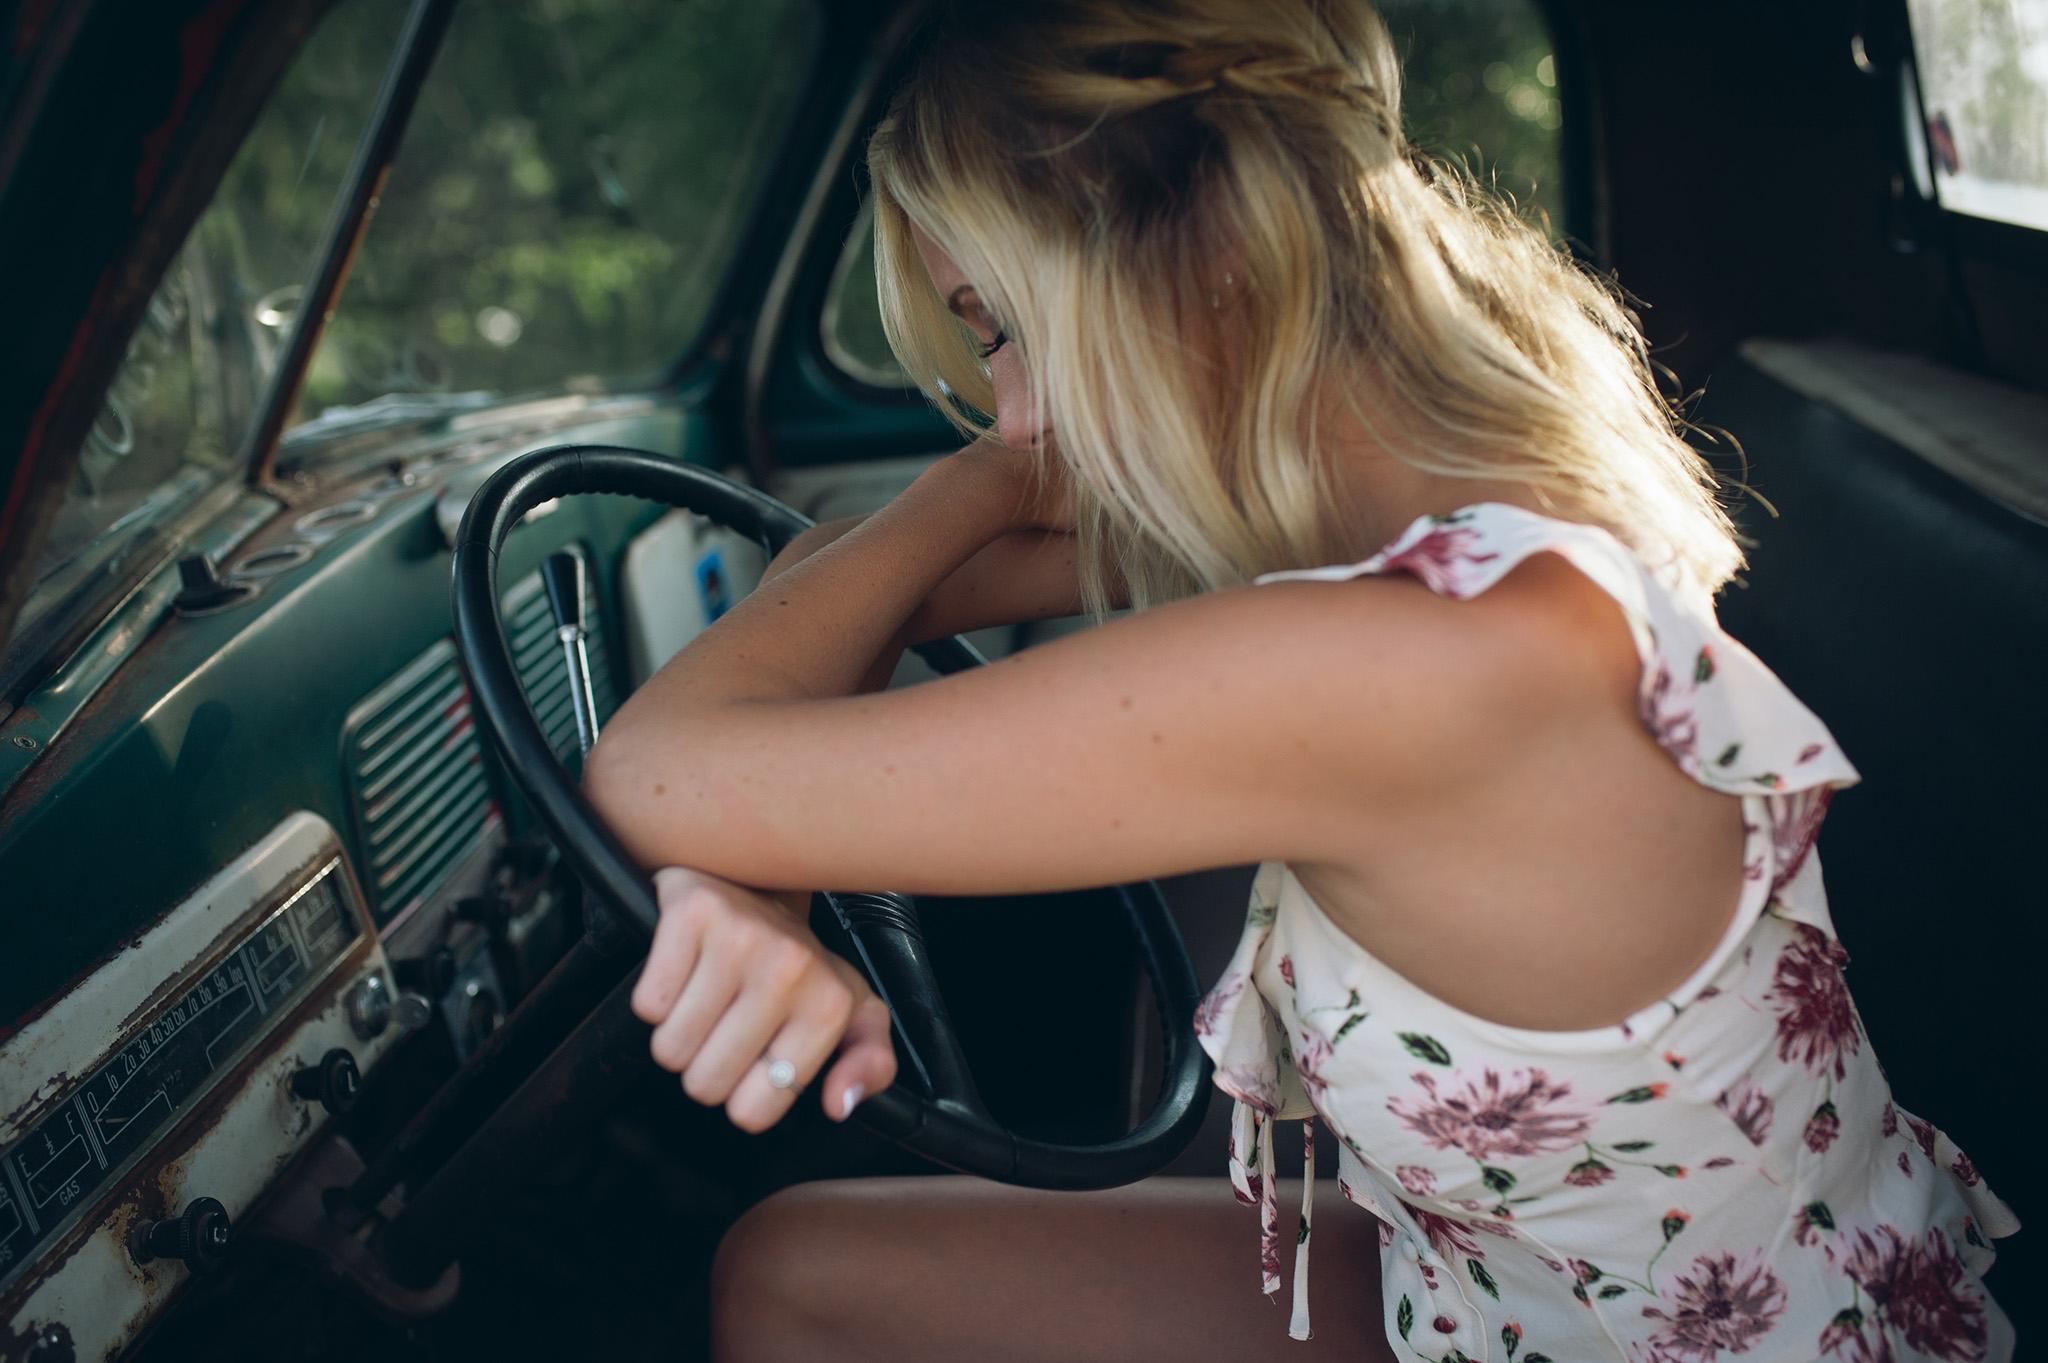 senior-picture-classic-truck-madison-wi.JPG